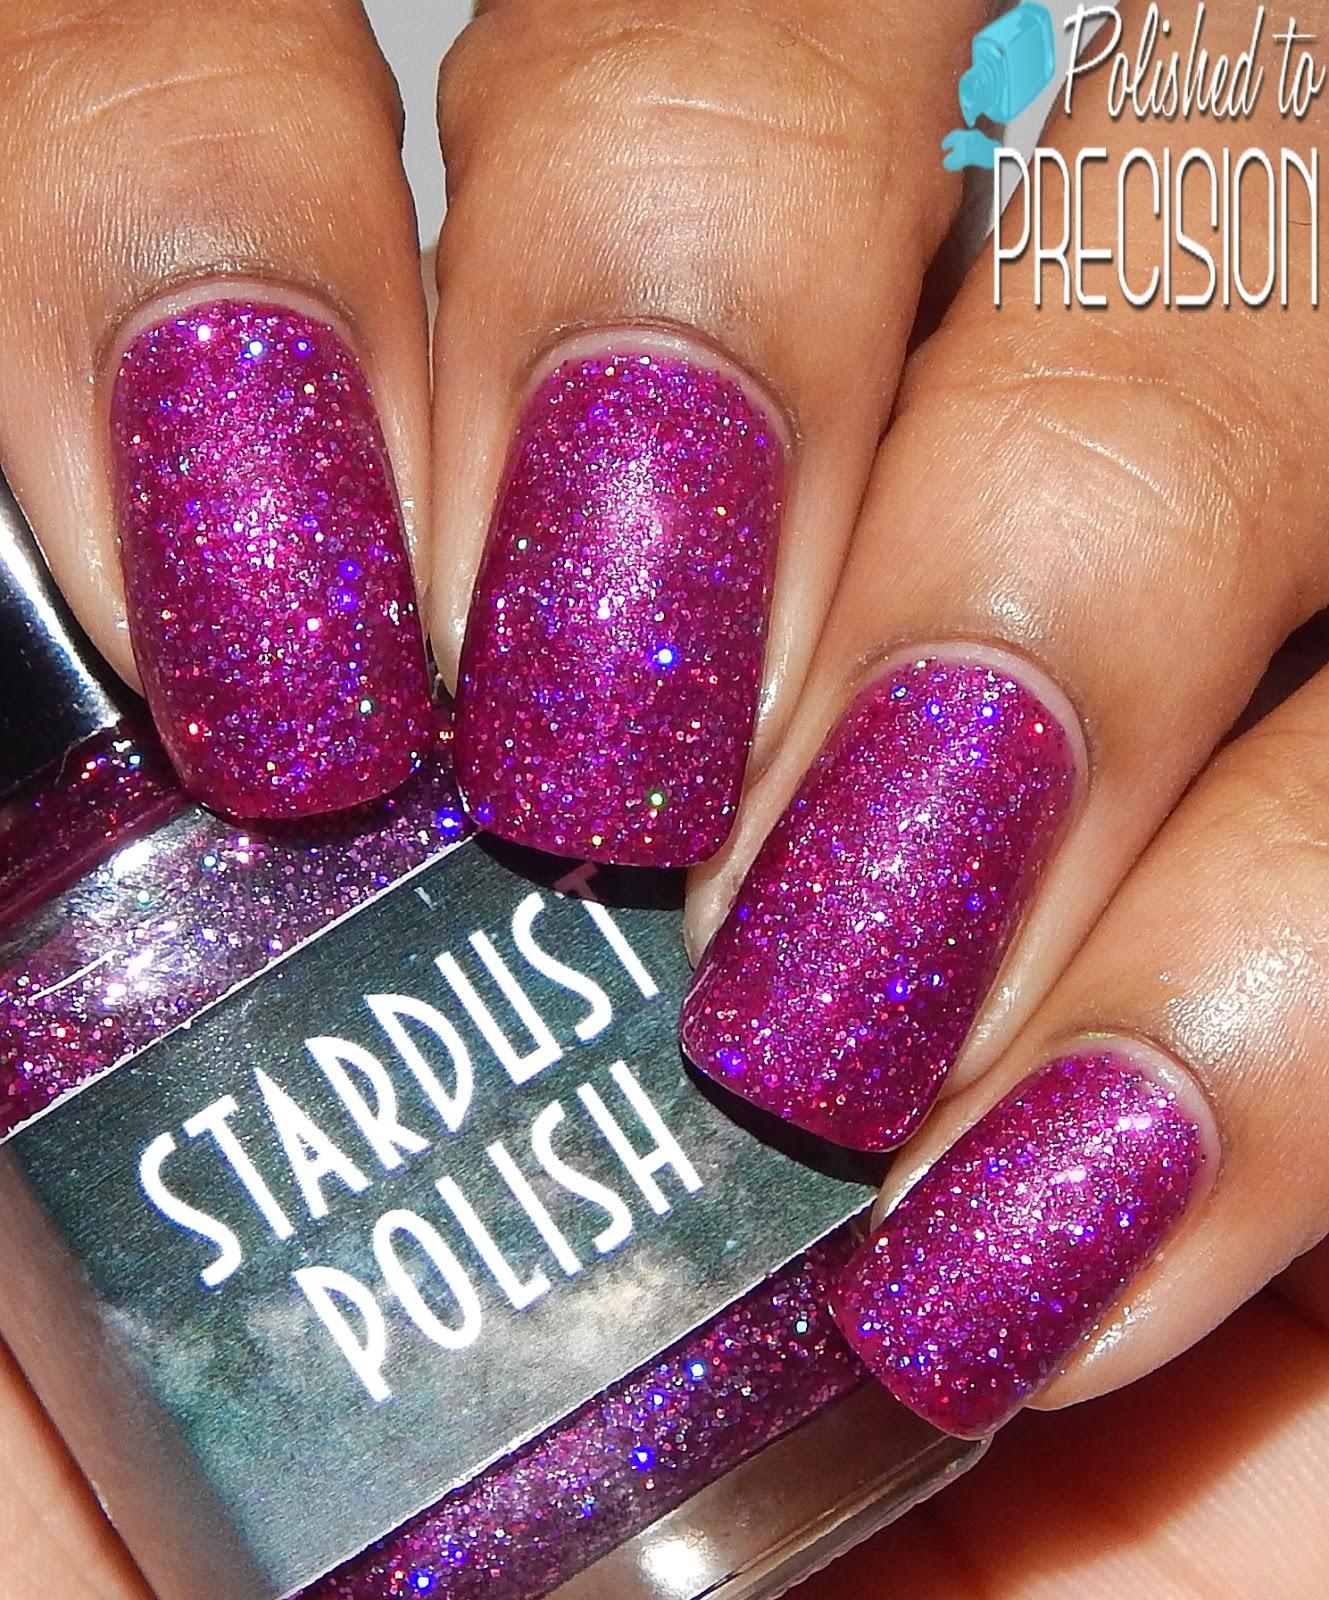 Stardust Polish Razzle Dazzle